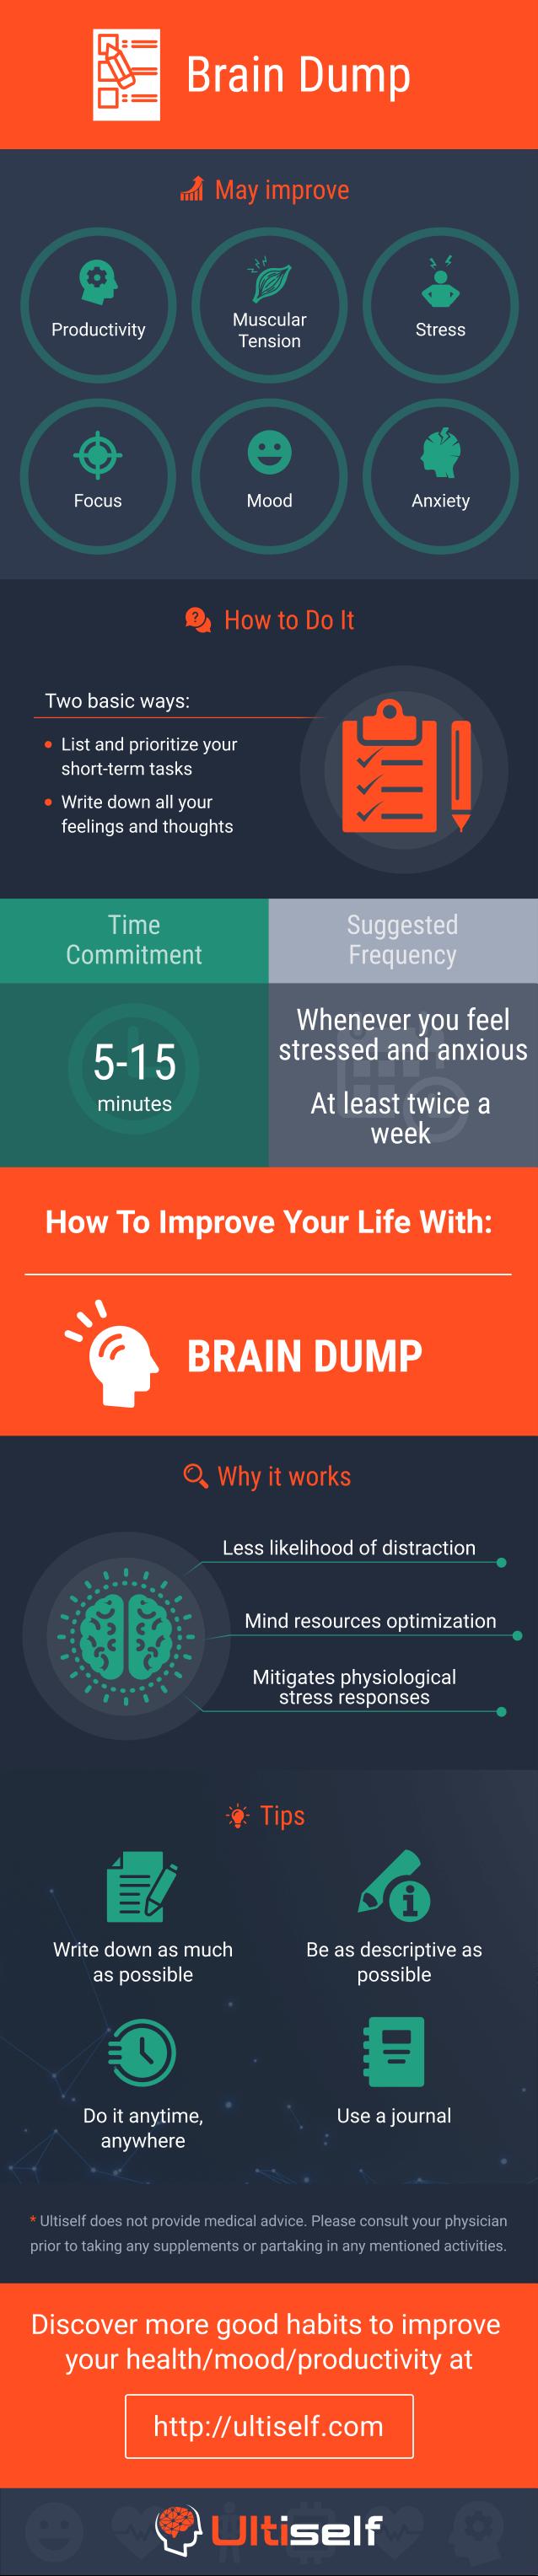 Brain Dump infographic